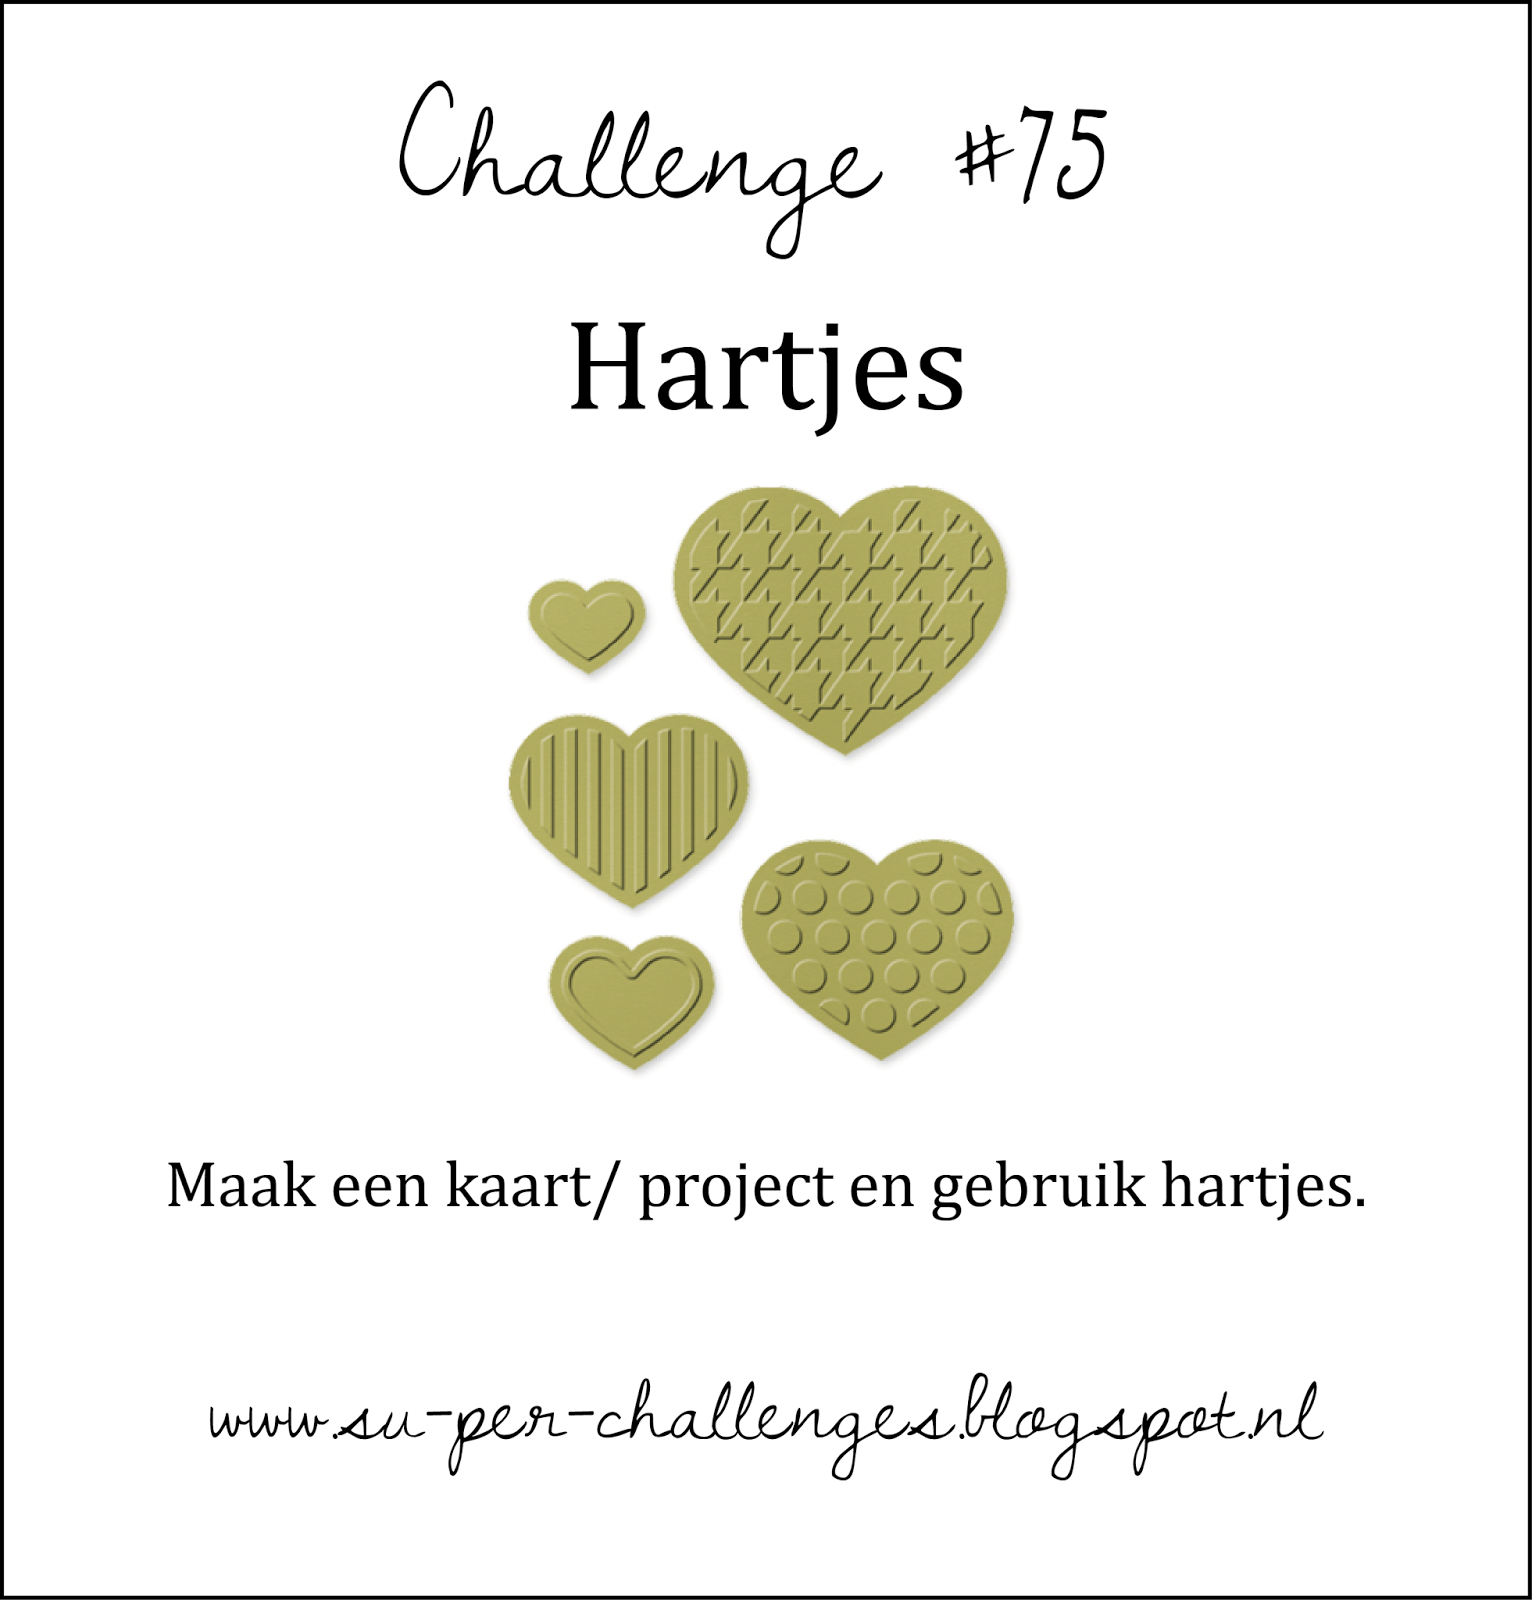 http://su-per-challenges.blogspot.nl/2015/02/challenge-75-hartjes.html